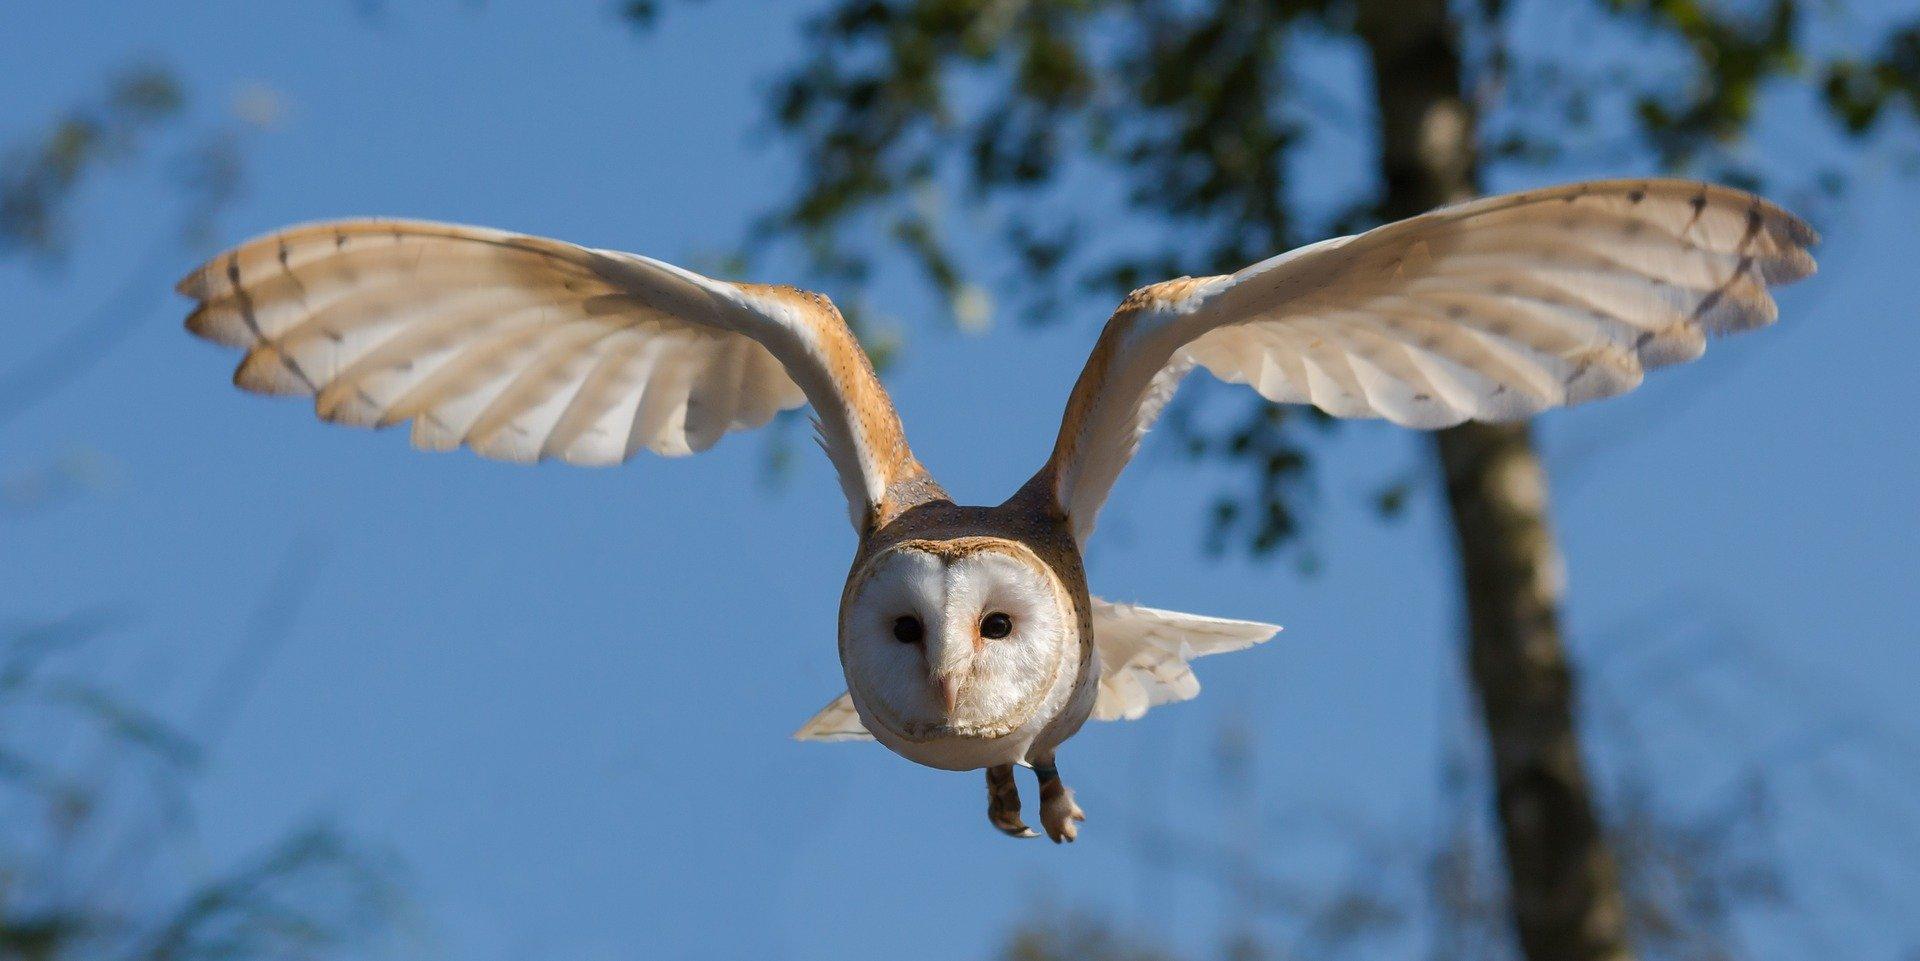 barn-owl-1107397_1920.jpg